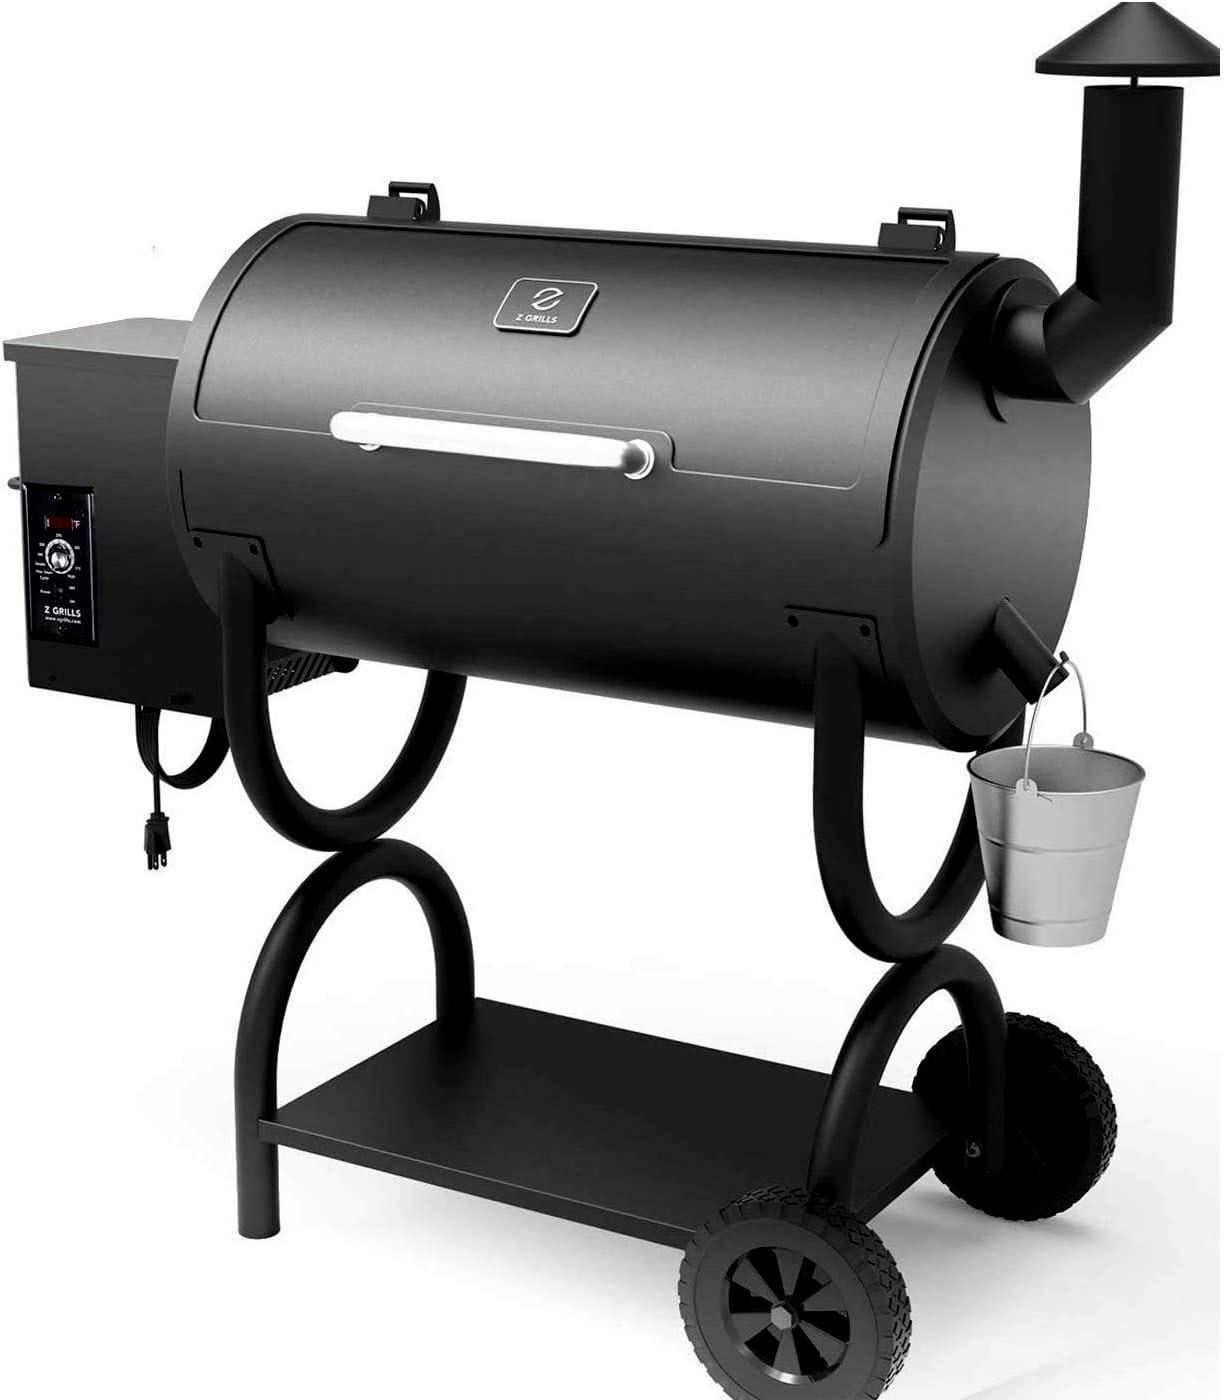 Z-GRILLS-ZPG-550B-Wood-Pellet-Grill-8-in-1-BBQ-Smoker